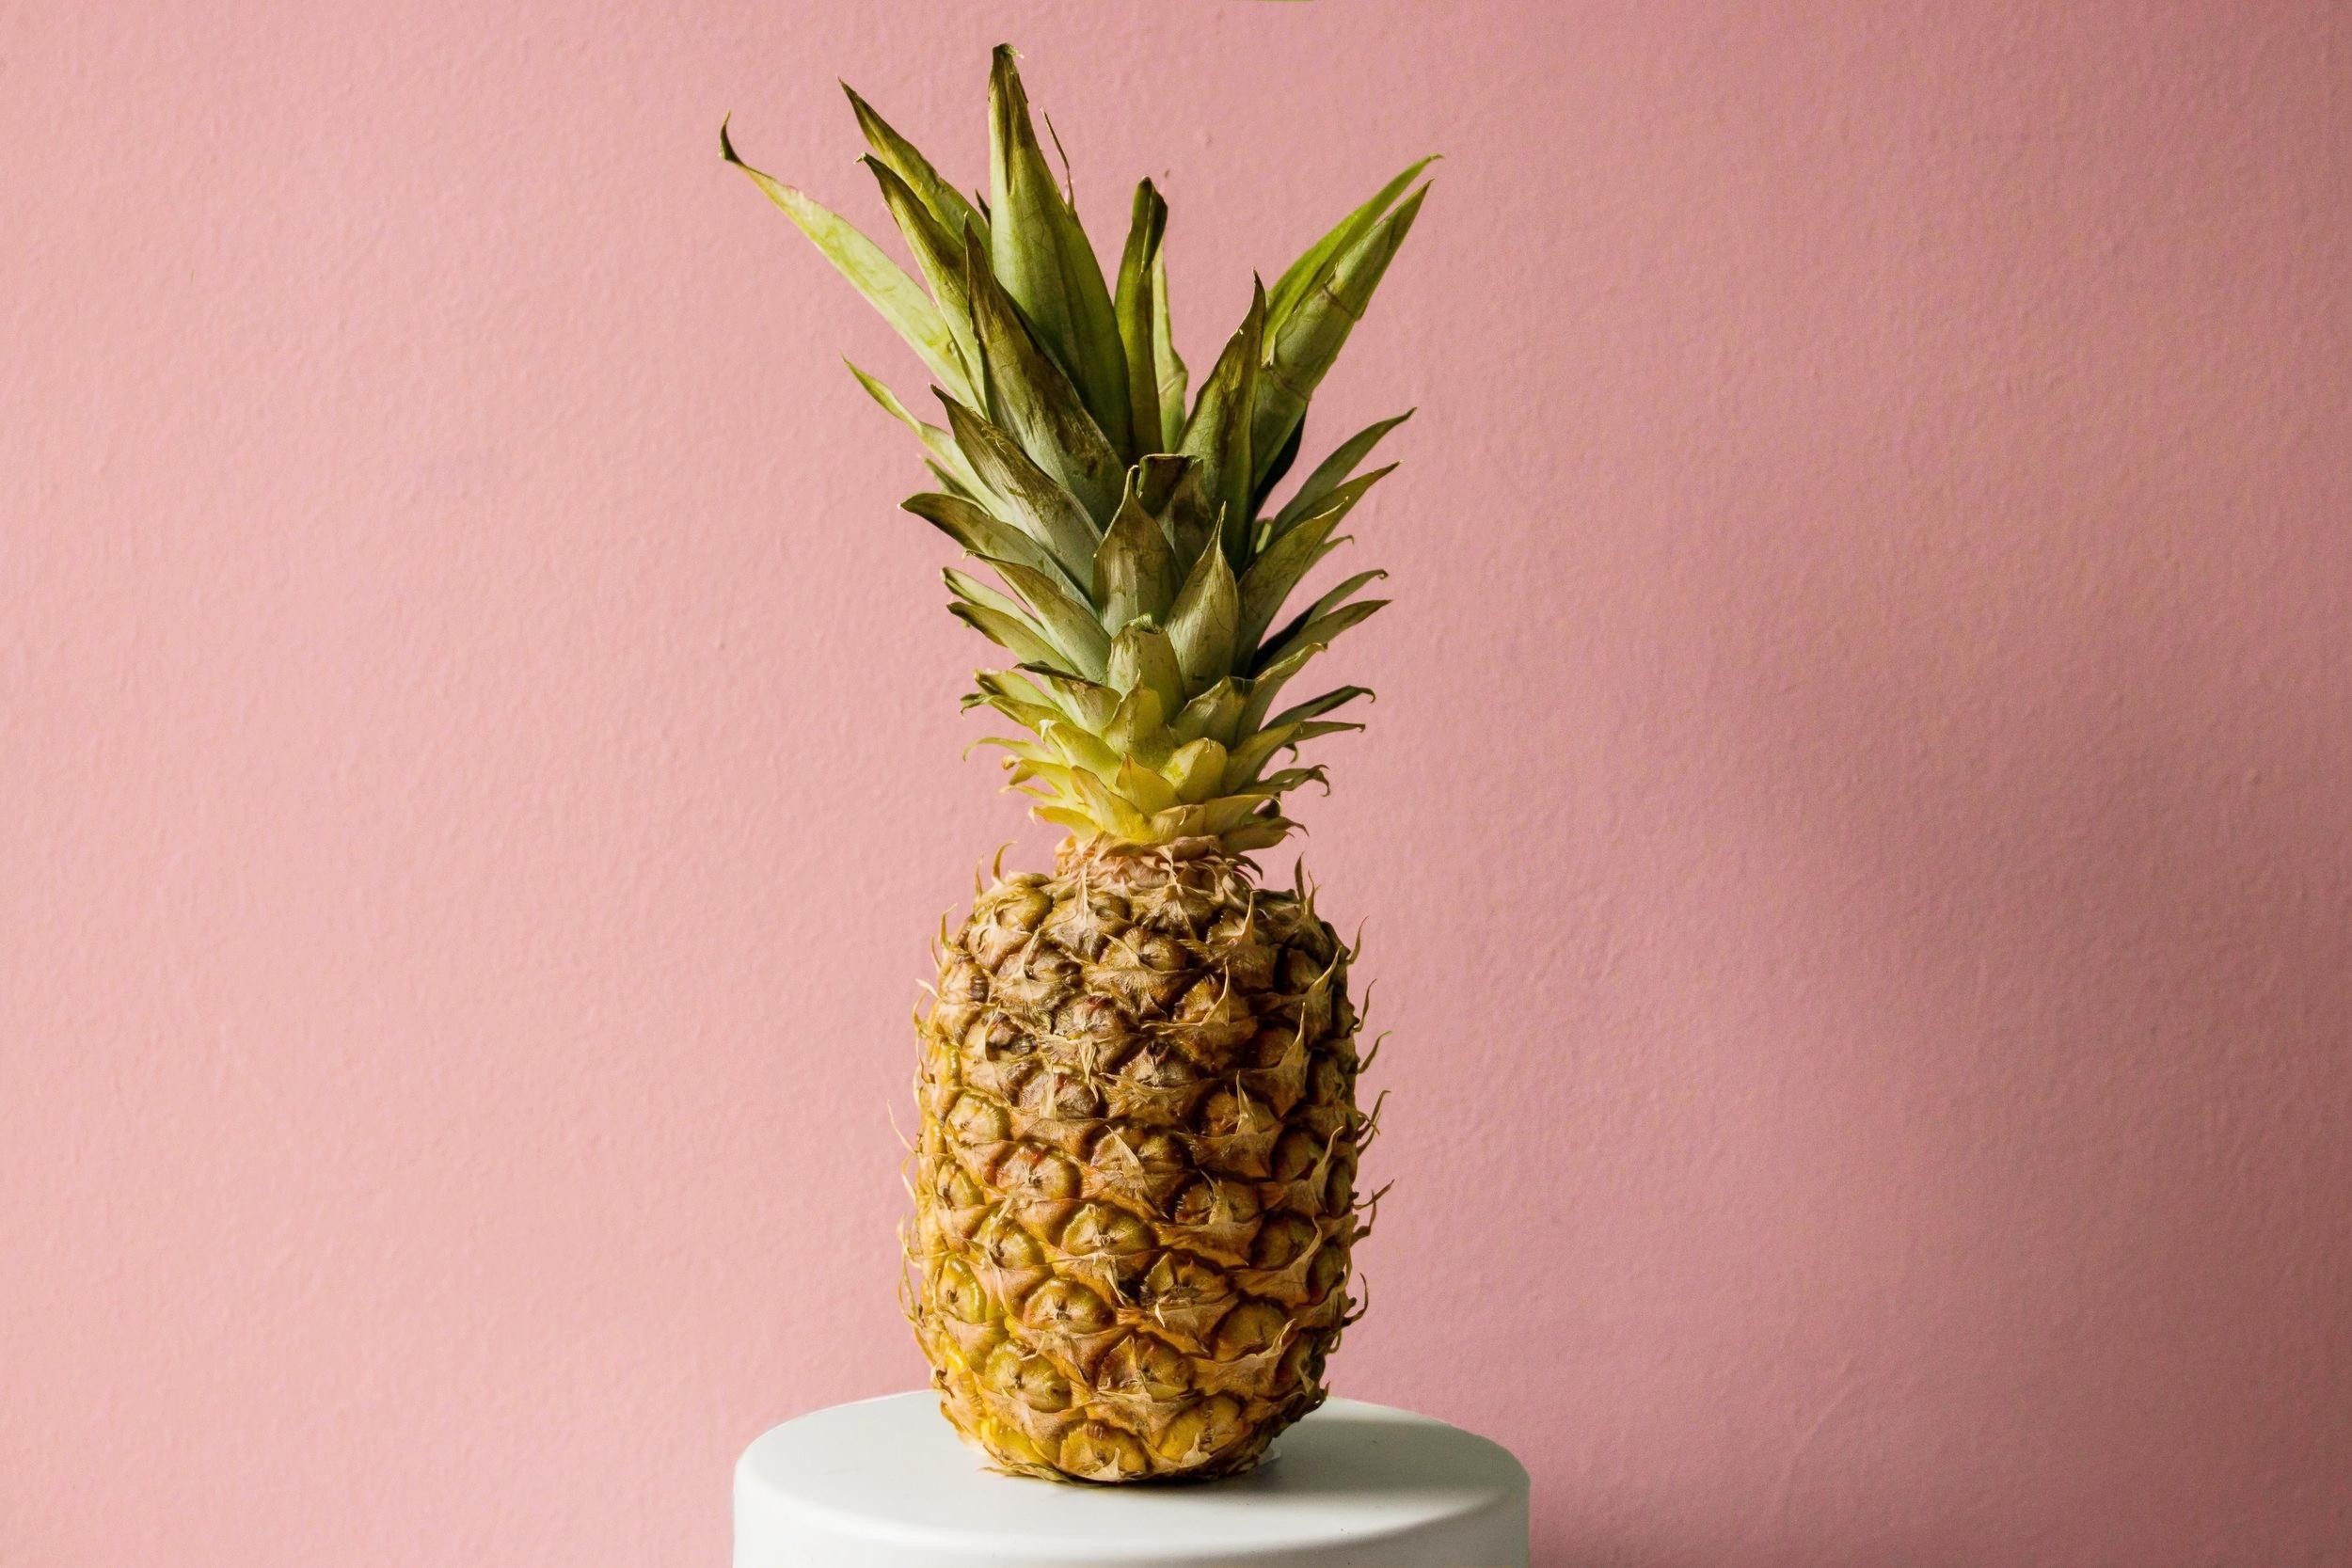 pink background + pineapple .jpg